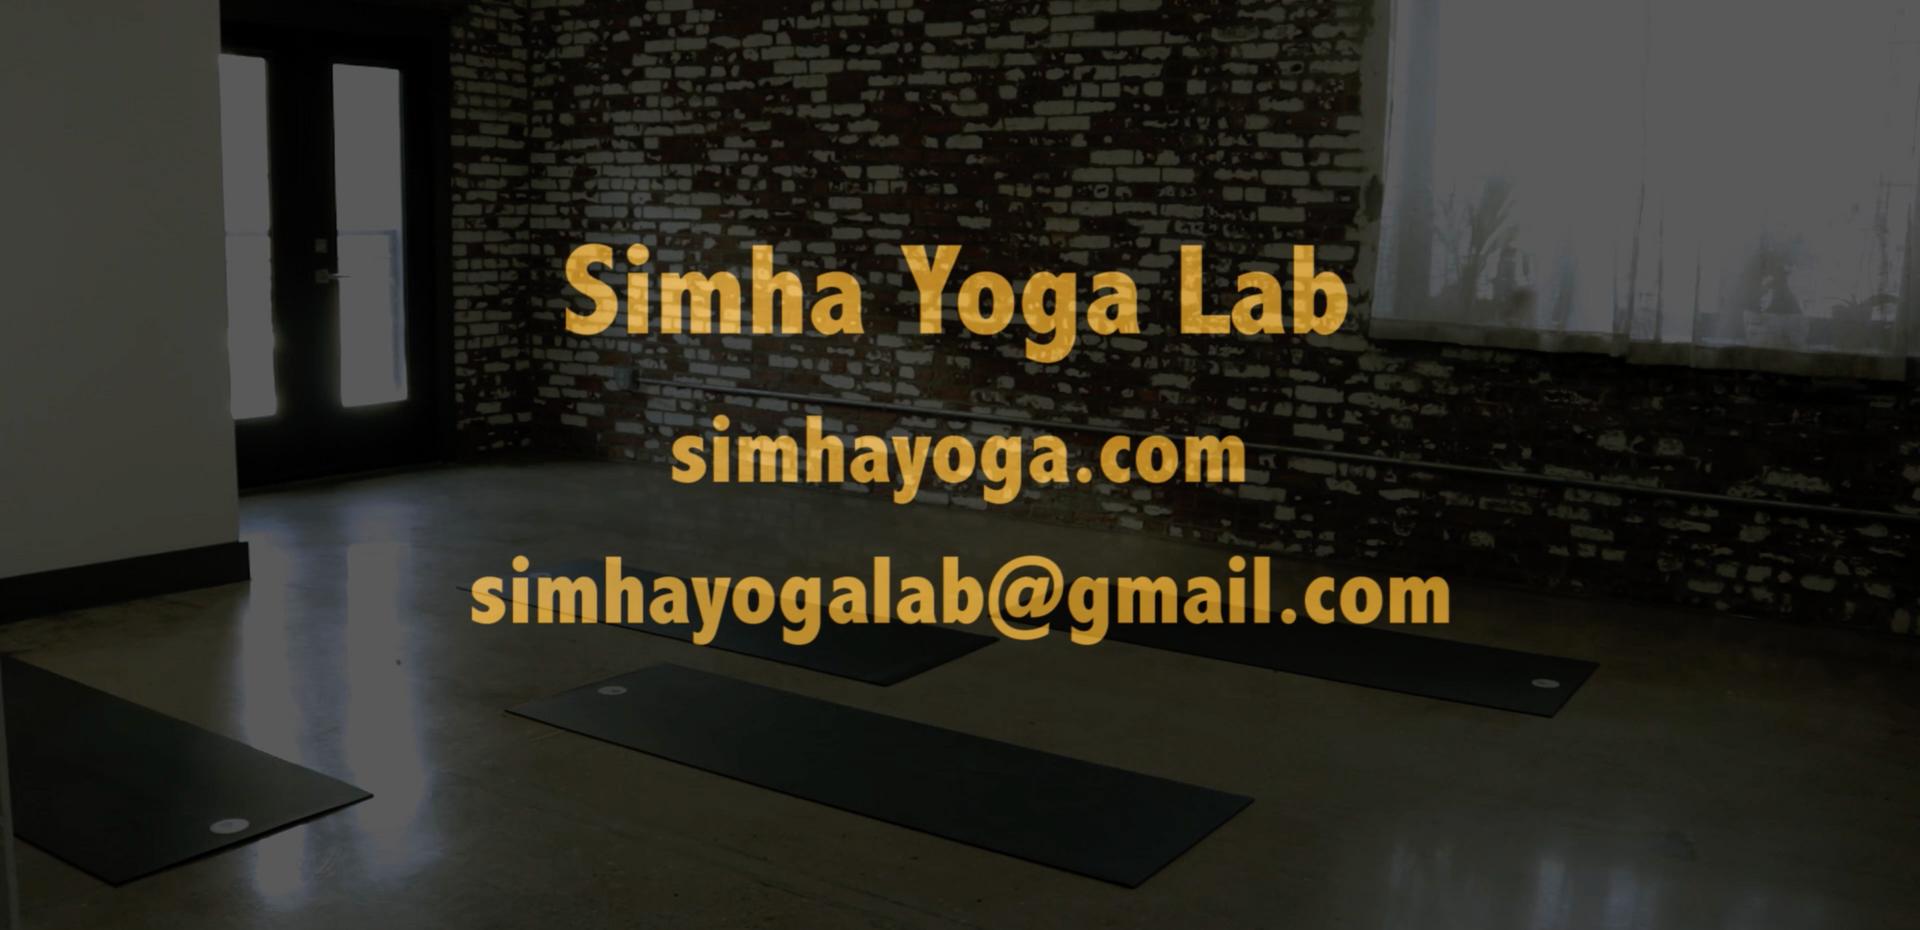 Simha Yoga Lab - 30 Sec Spot